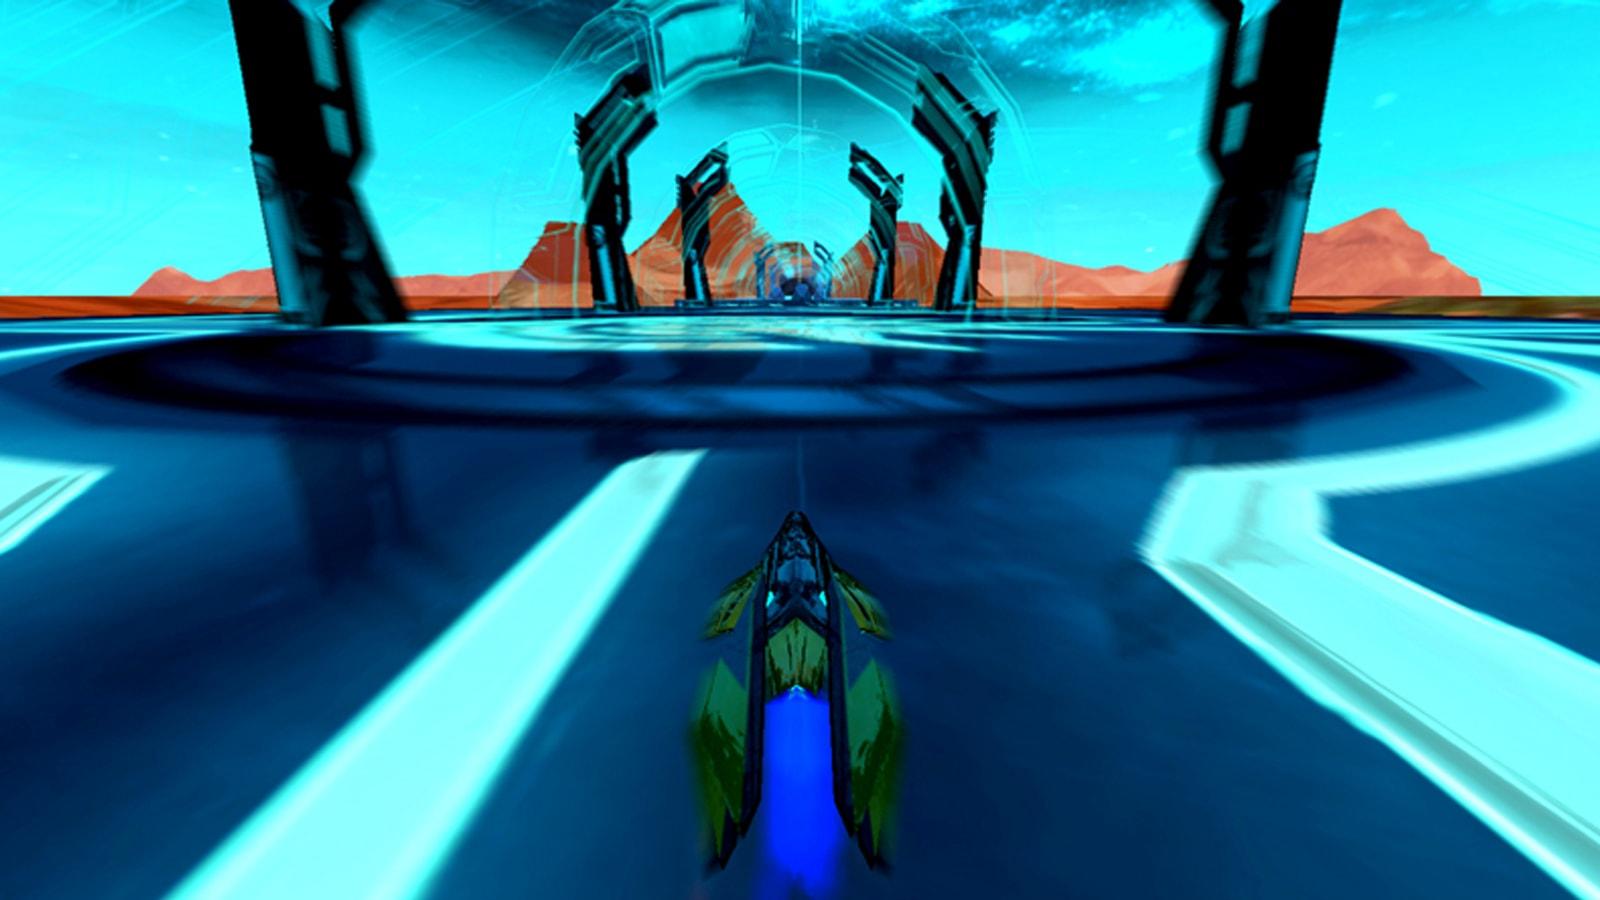 A spacecraft zooms through a blue alien construct.